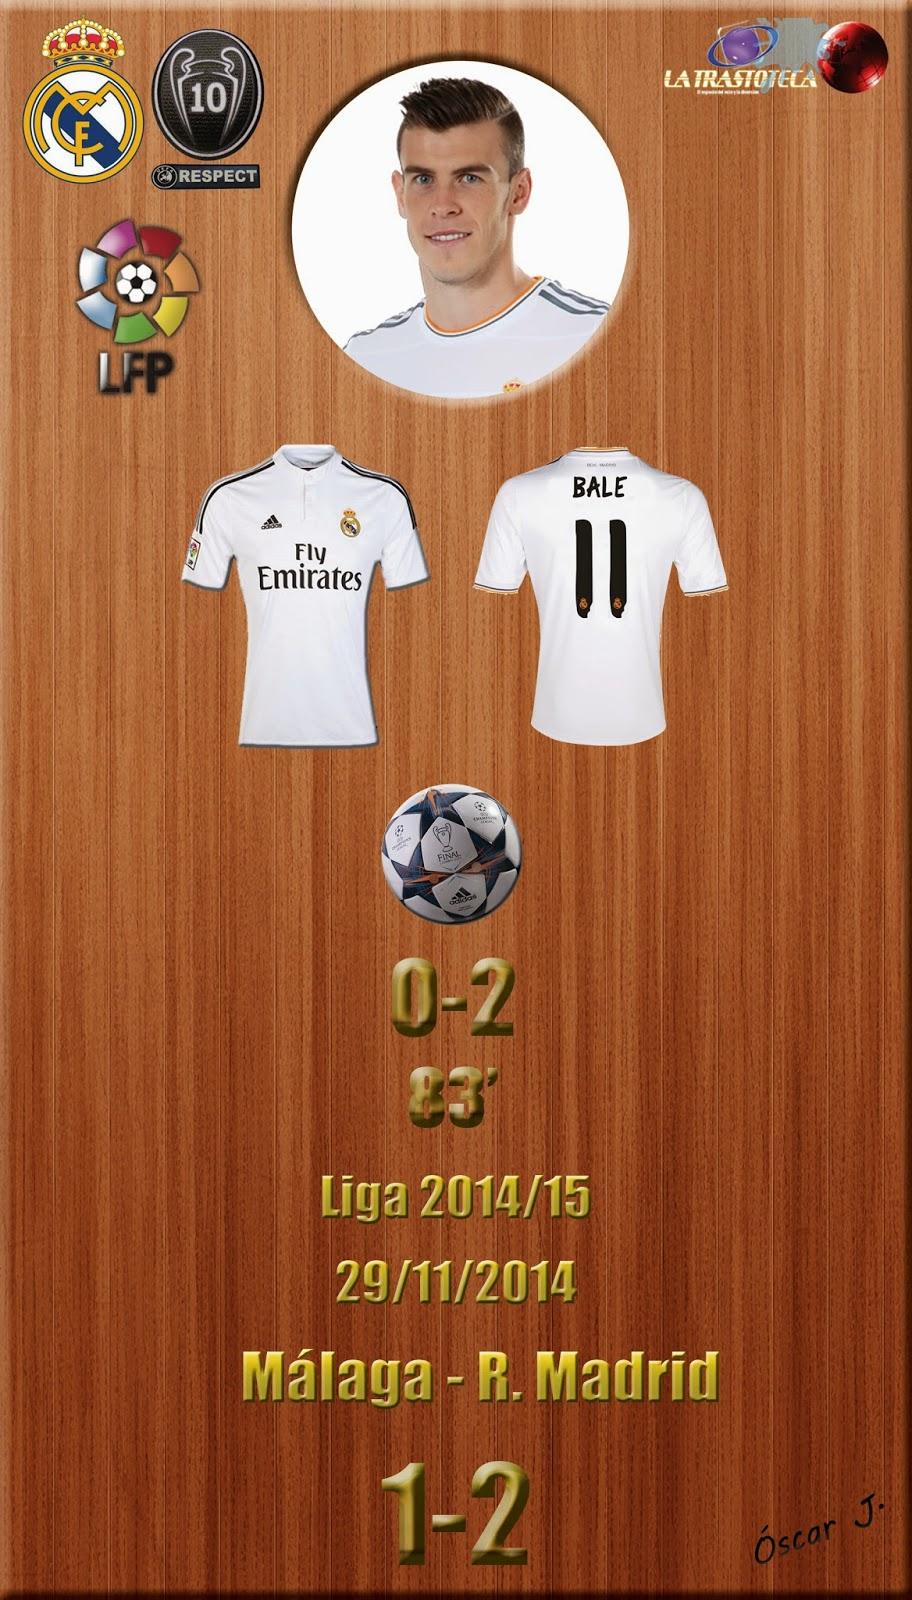 Málaga 1-4 Real Madrid. Liga 2014/15 - Jornada 13 (29/11/2014). Golazos de Benzema y Bale.